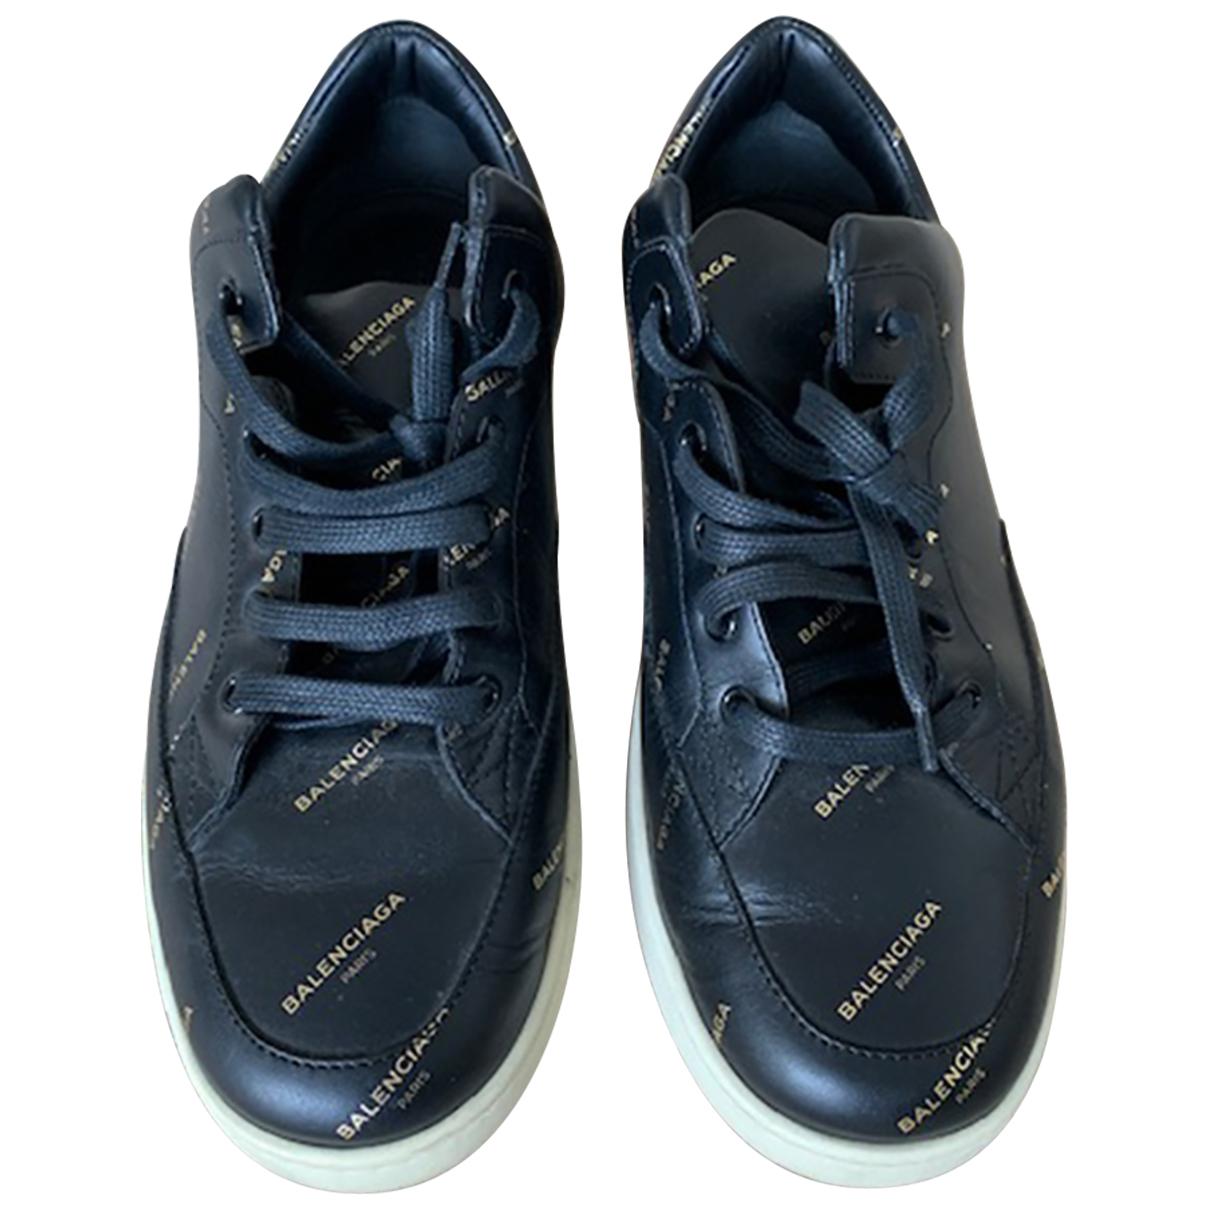 Balenciaga N Black Leather Trainers for Women 41 EU